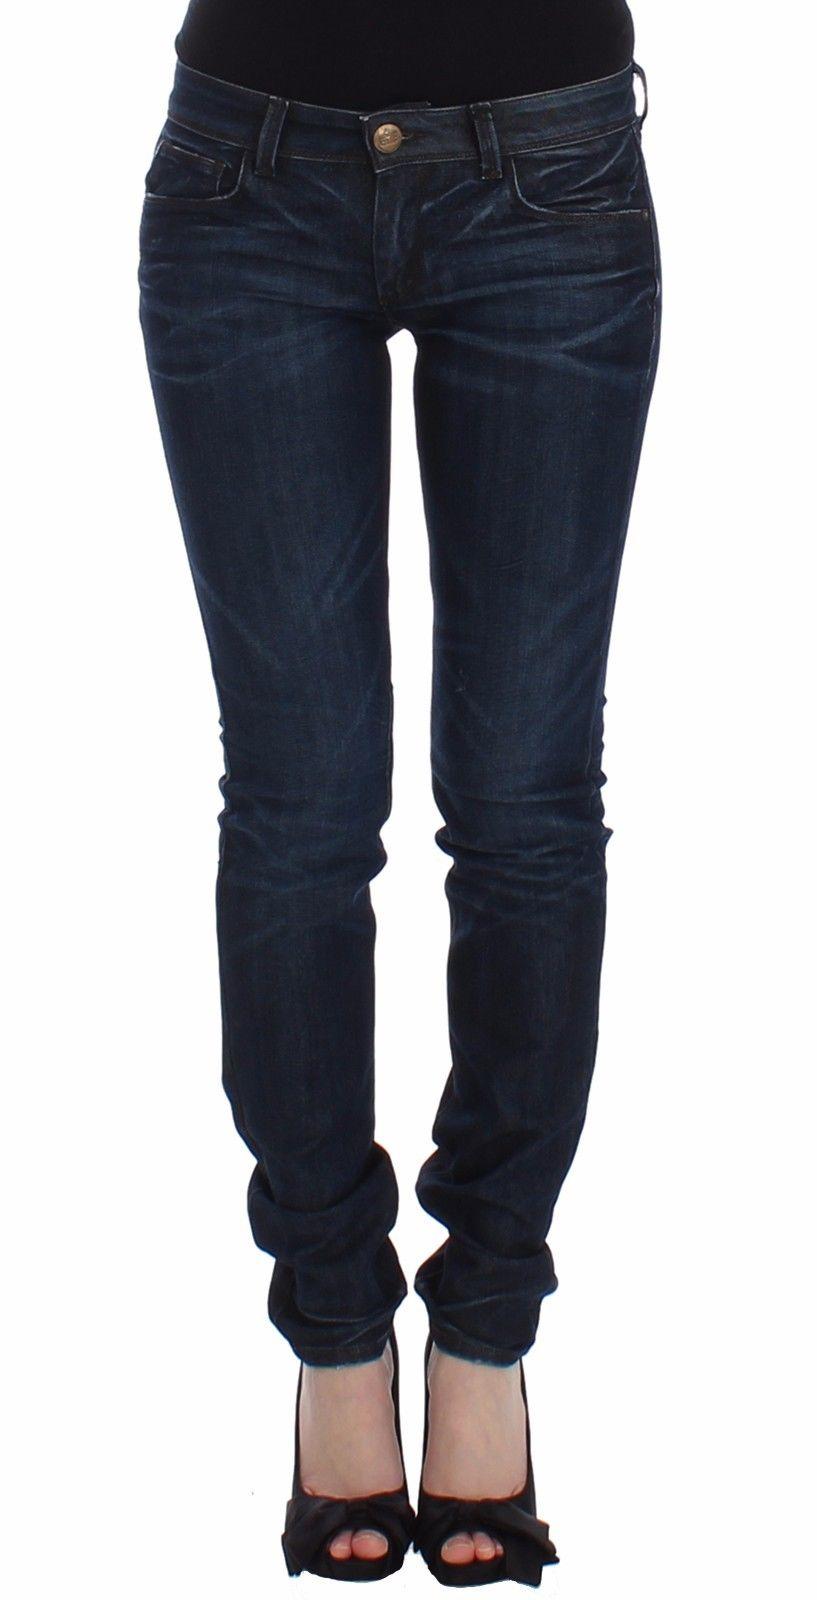 Ermanno Scervino Women's Skinny Leg Jeans Blue SIG12473 - W26